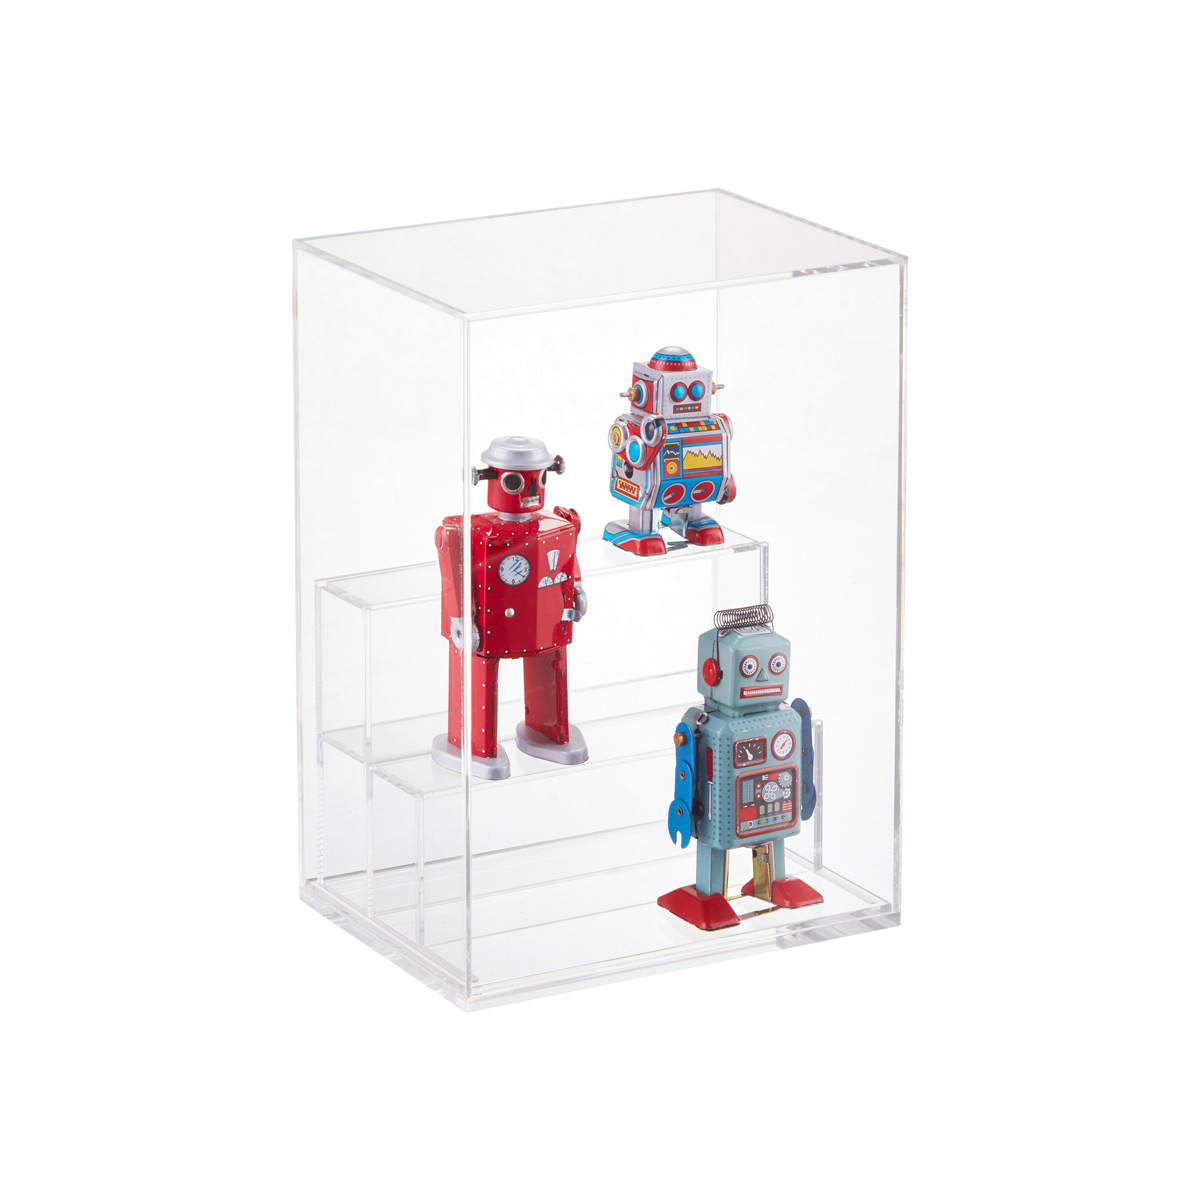 Small Modular Acrylic Premium Display Case